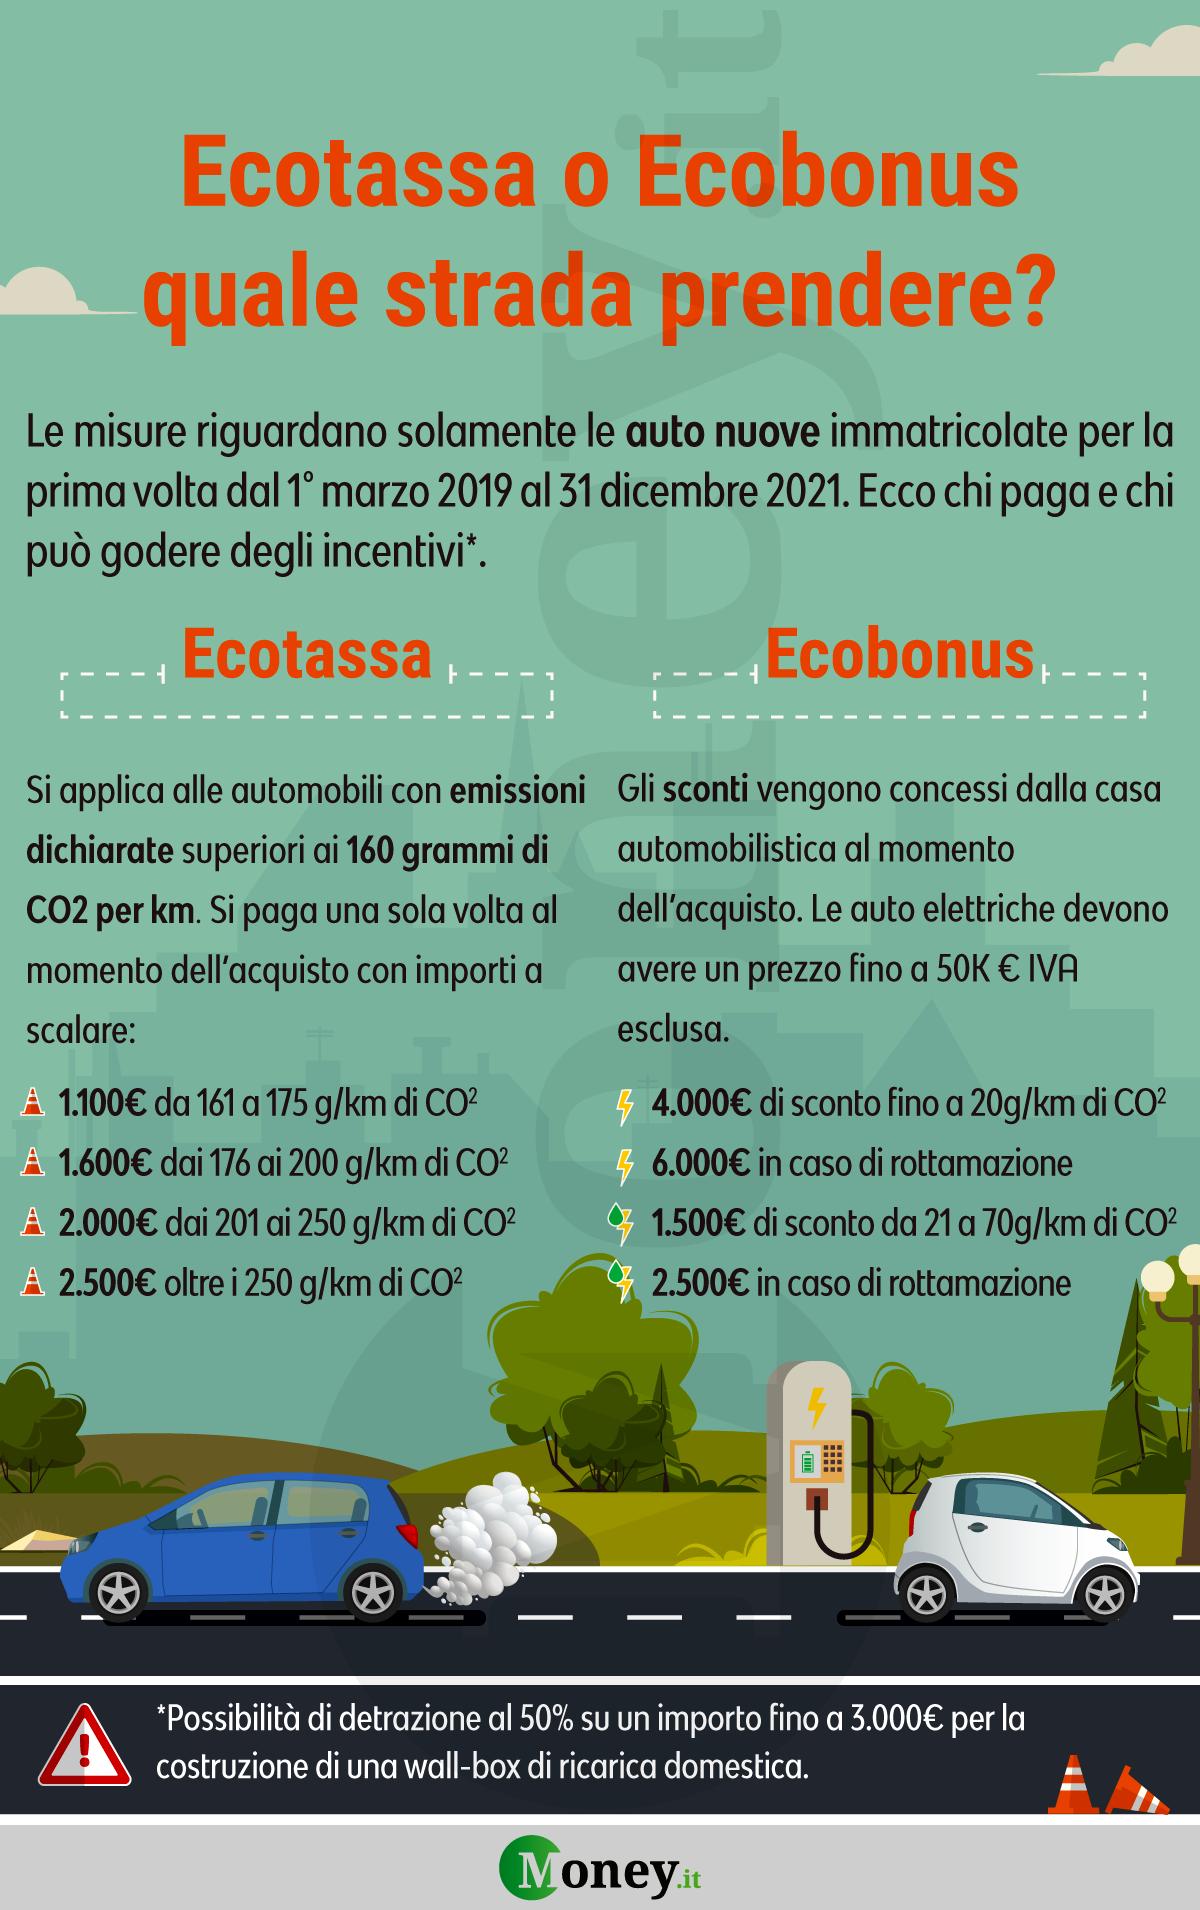 Ecotassa_Ecobonus_Infografica-2